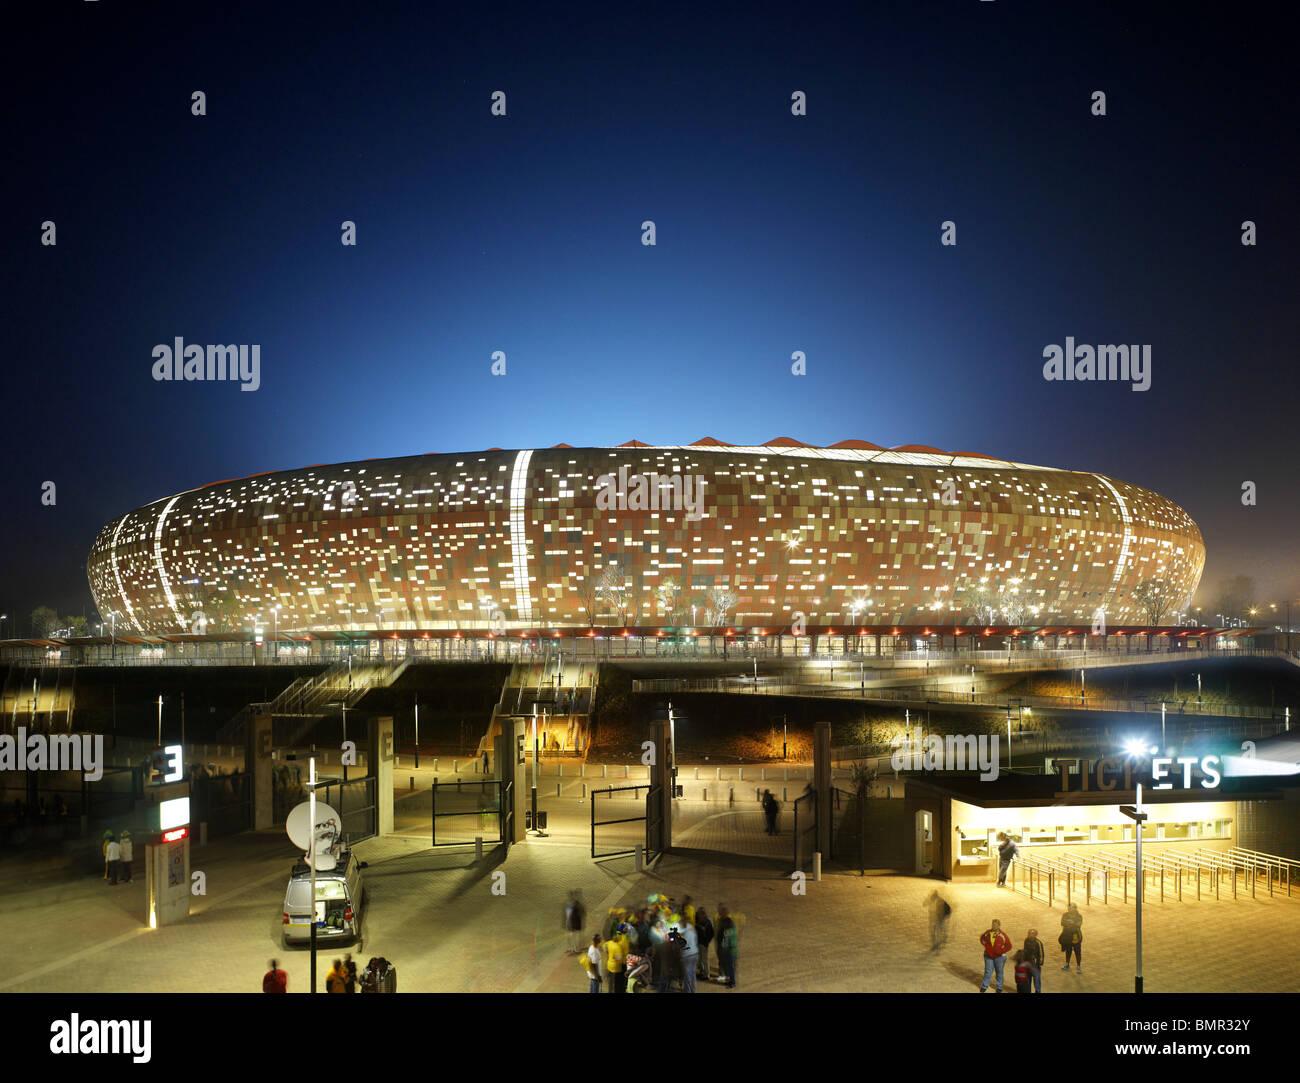 SOCCER CITY STADIUM, POPULOUS ARCHITECTS, JOHANNESBURG, SOUTH AFRICA, 2010 - Stock Image